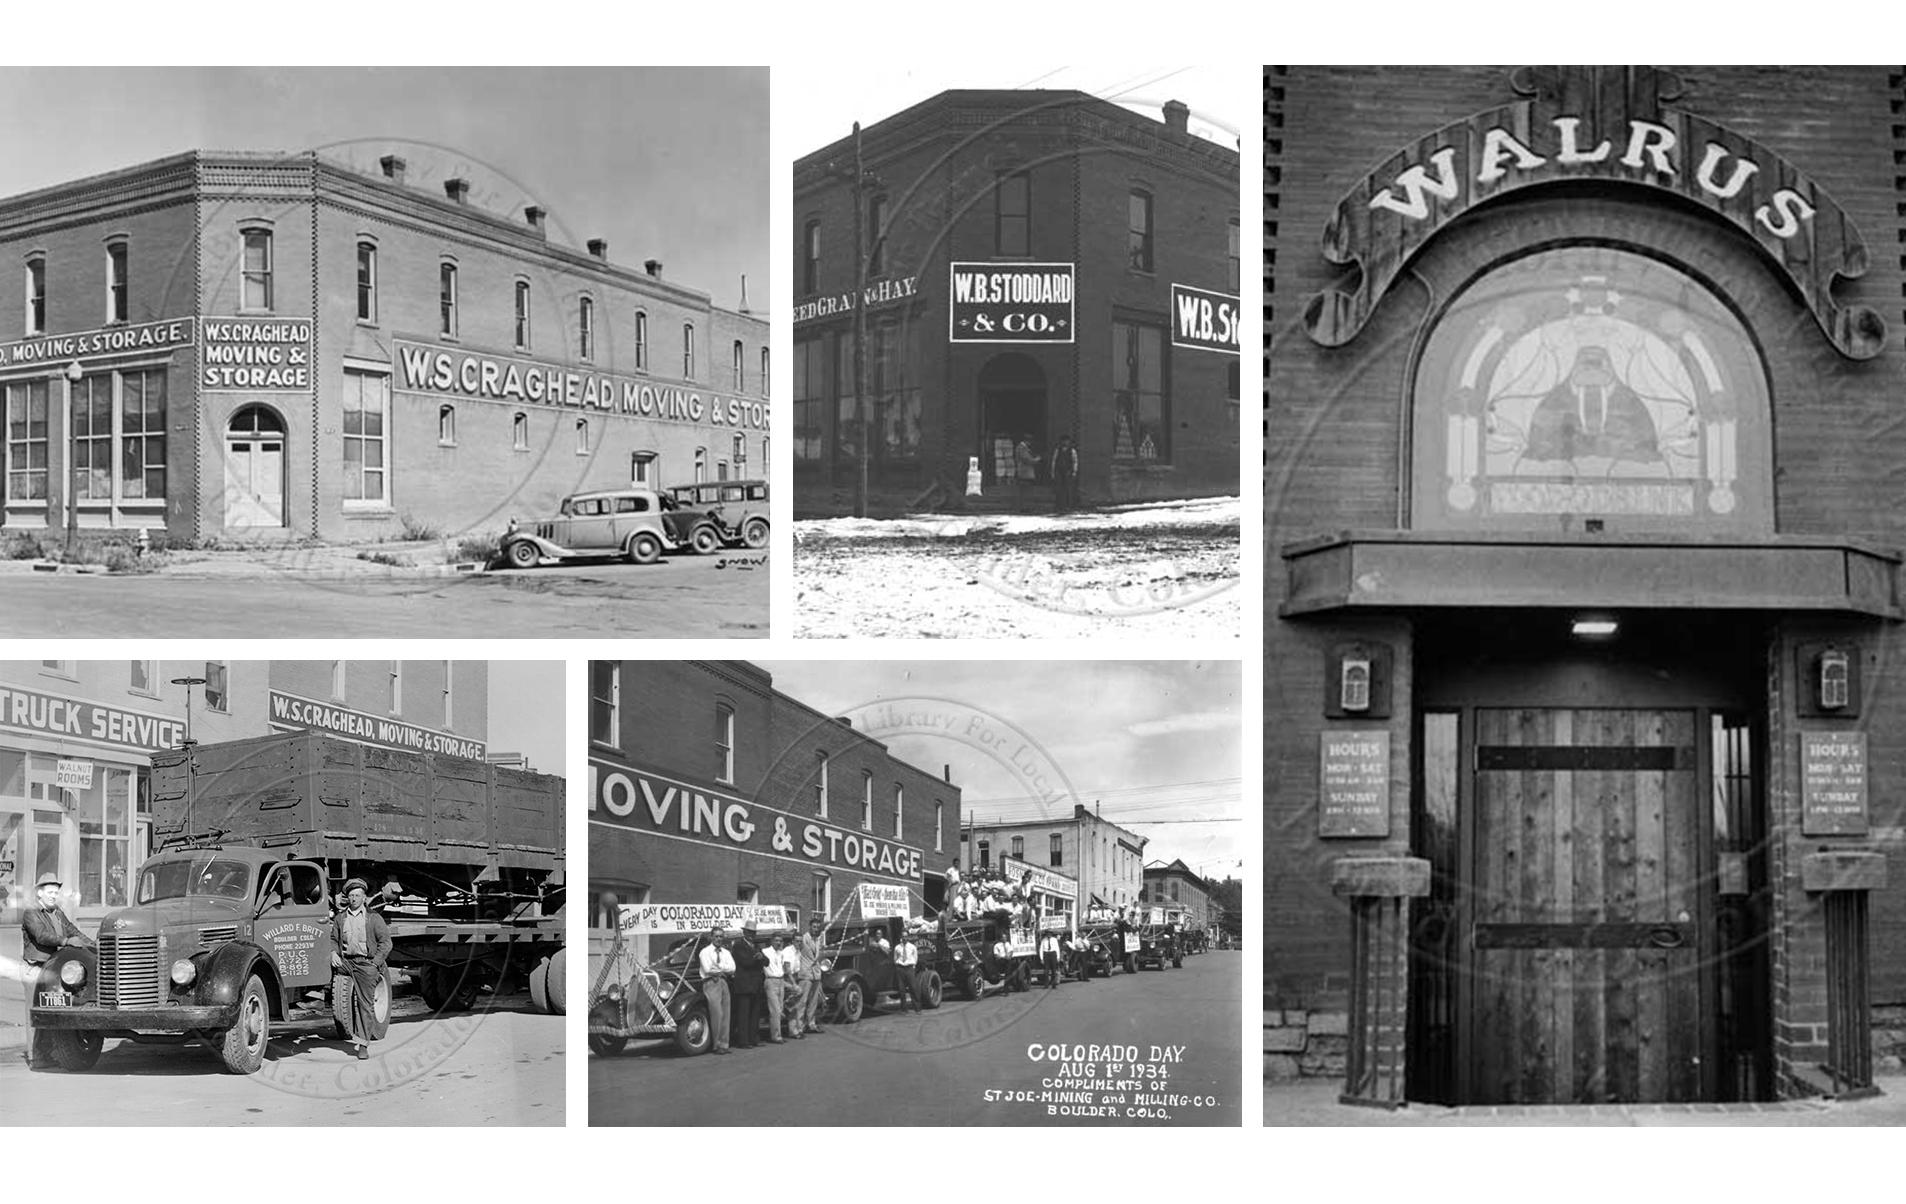 historic photos of 1911 broadway